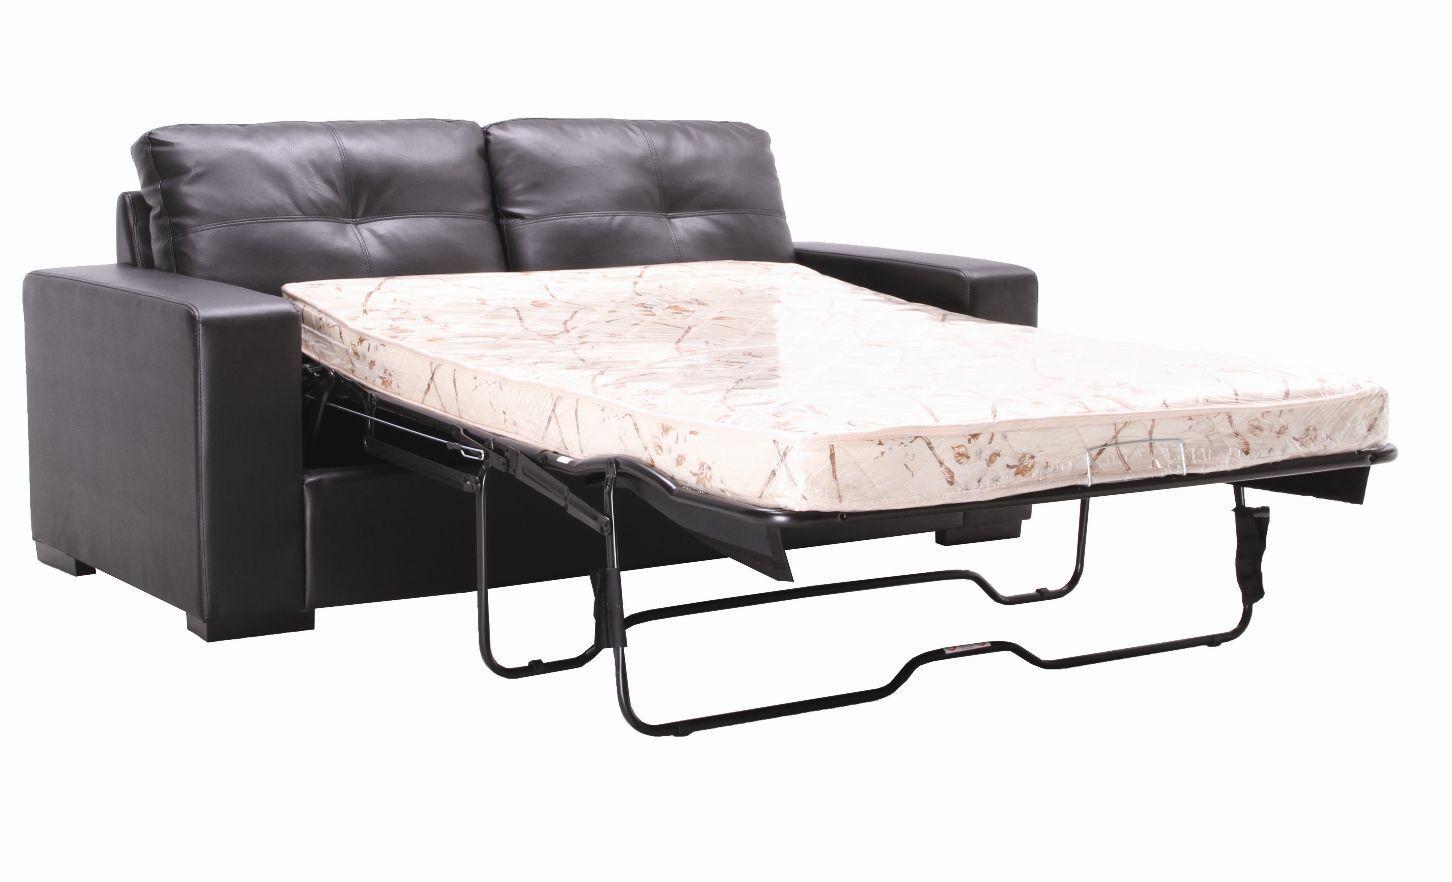 sofa bed slat nz leather designs 2018 futon new zealand